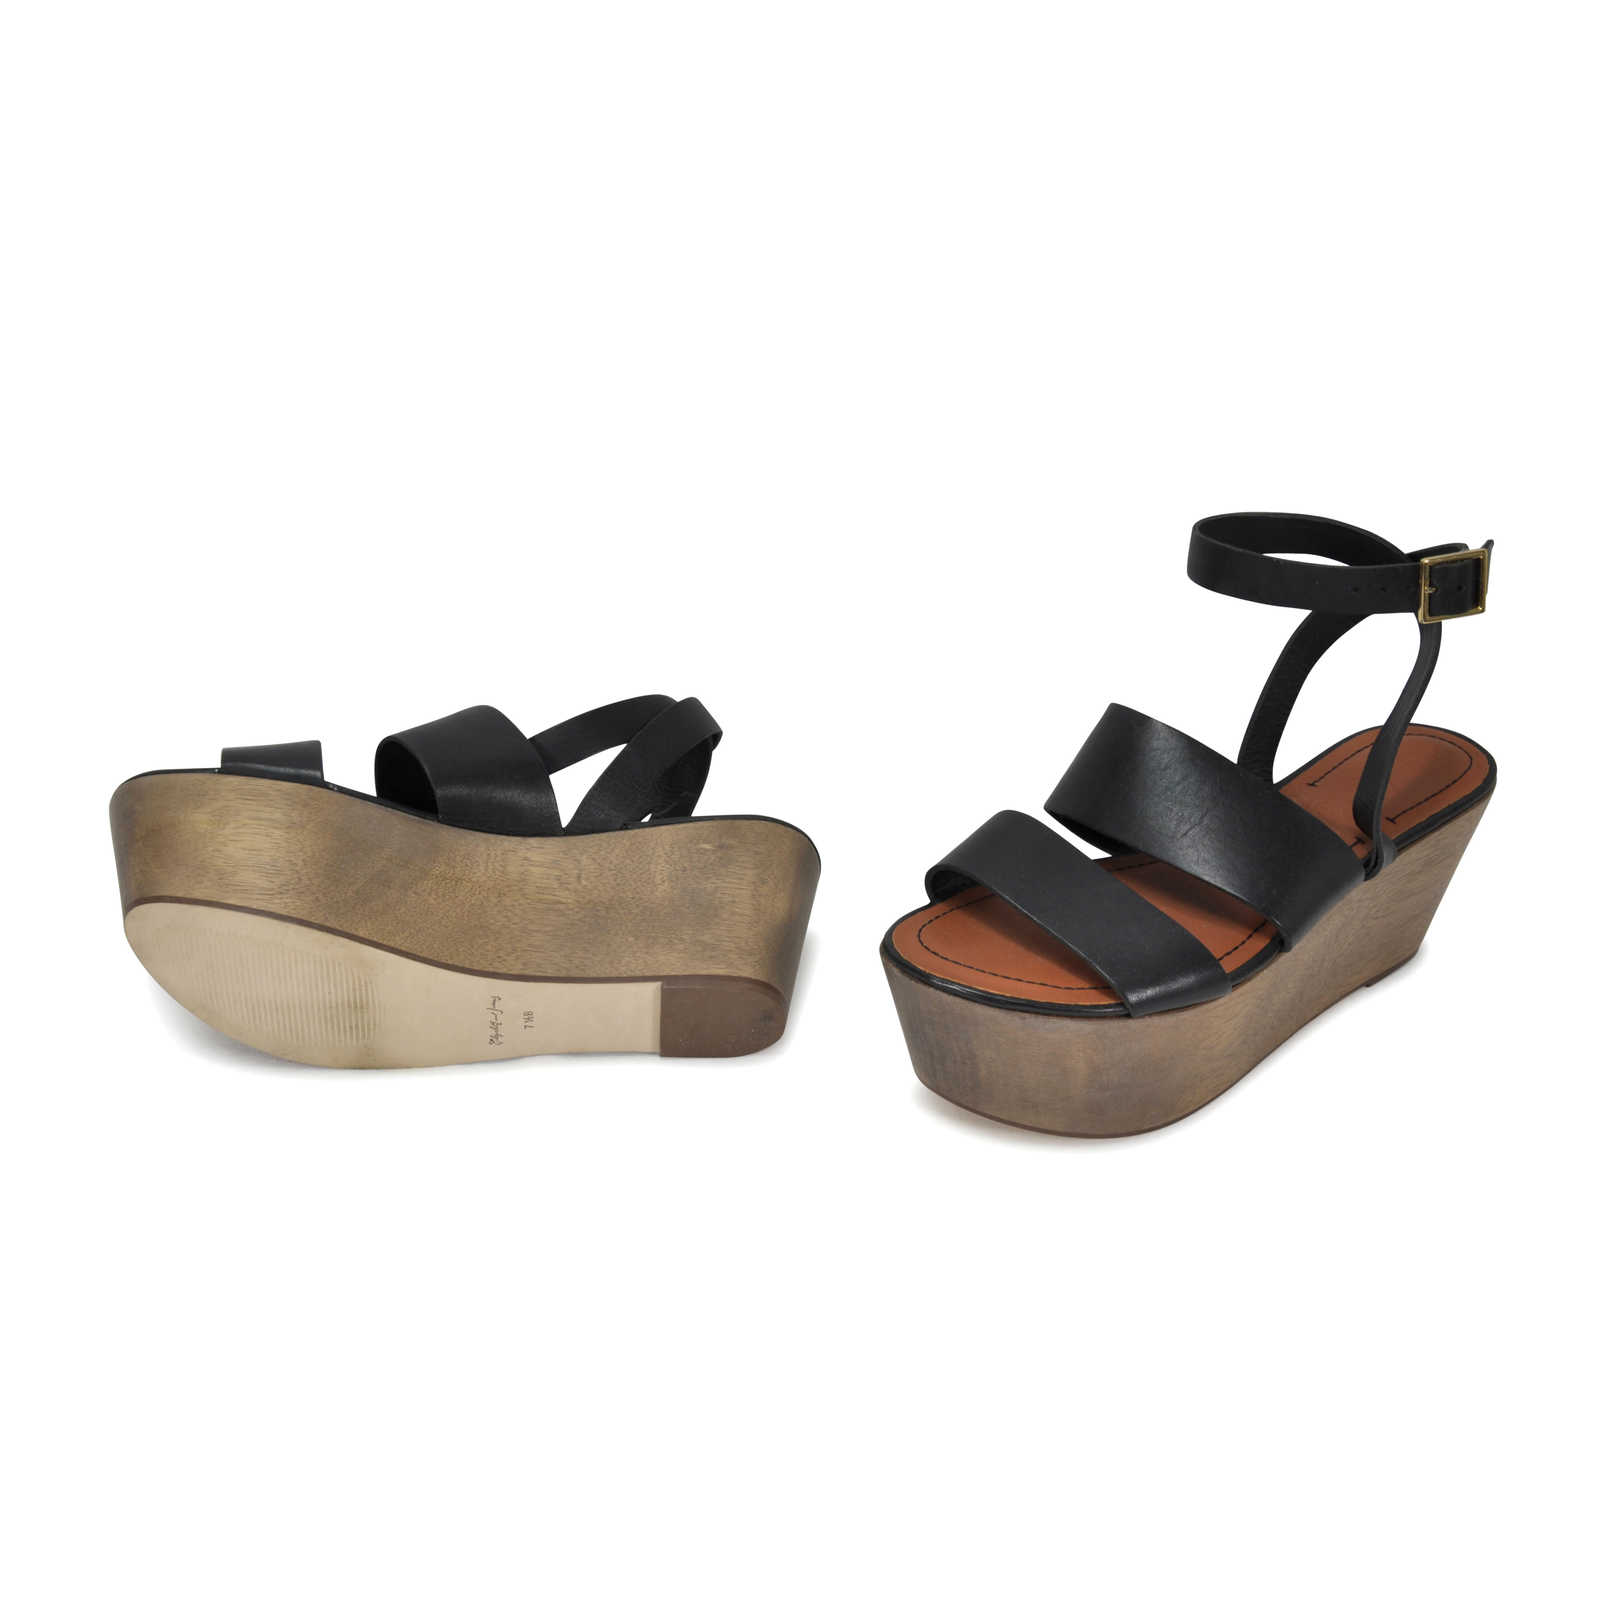 7e2a02939 ... Authentic Second Hand Elizabeth and James Bax Flatform Sandals  (PSS-284-00008) ...